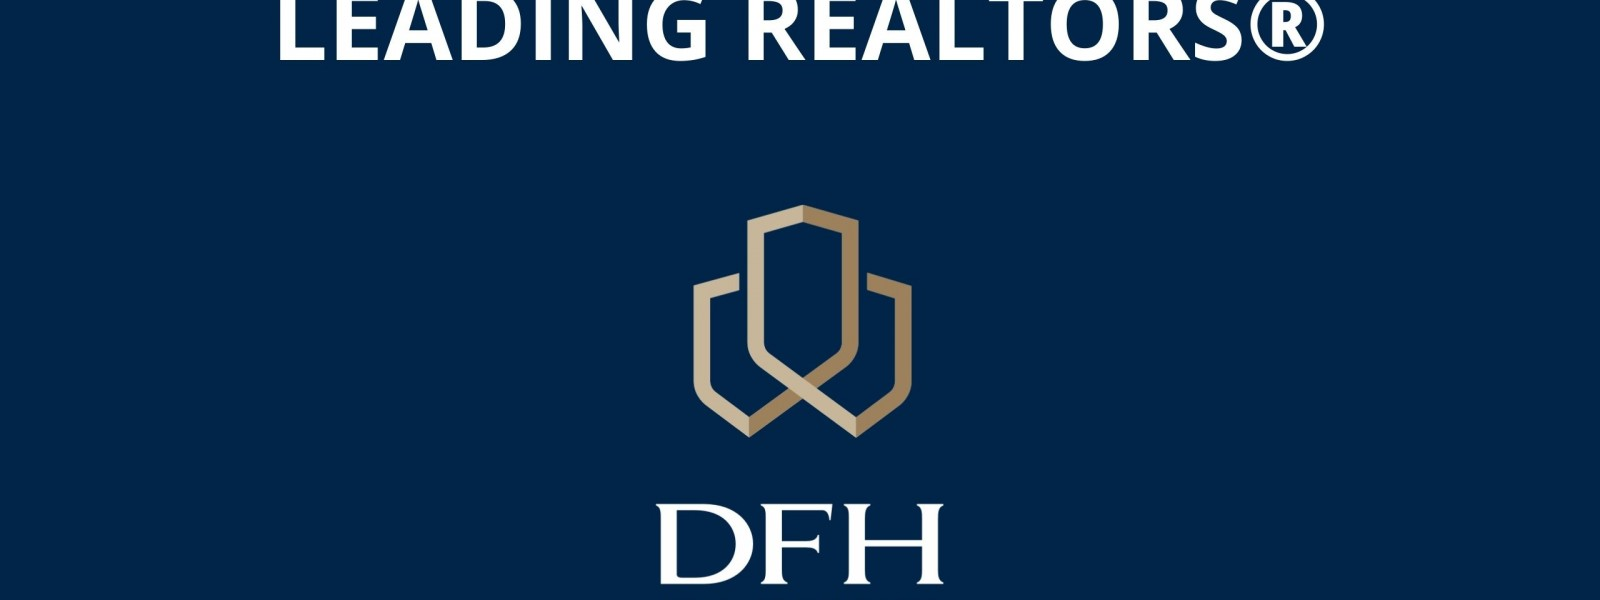 dfh leading realtors march 2021